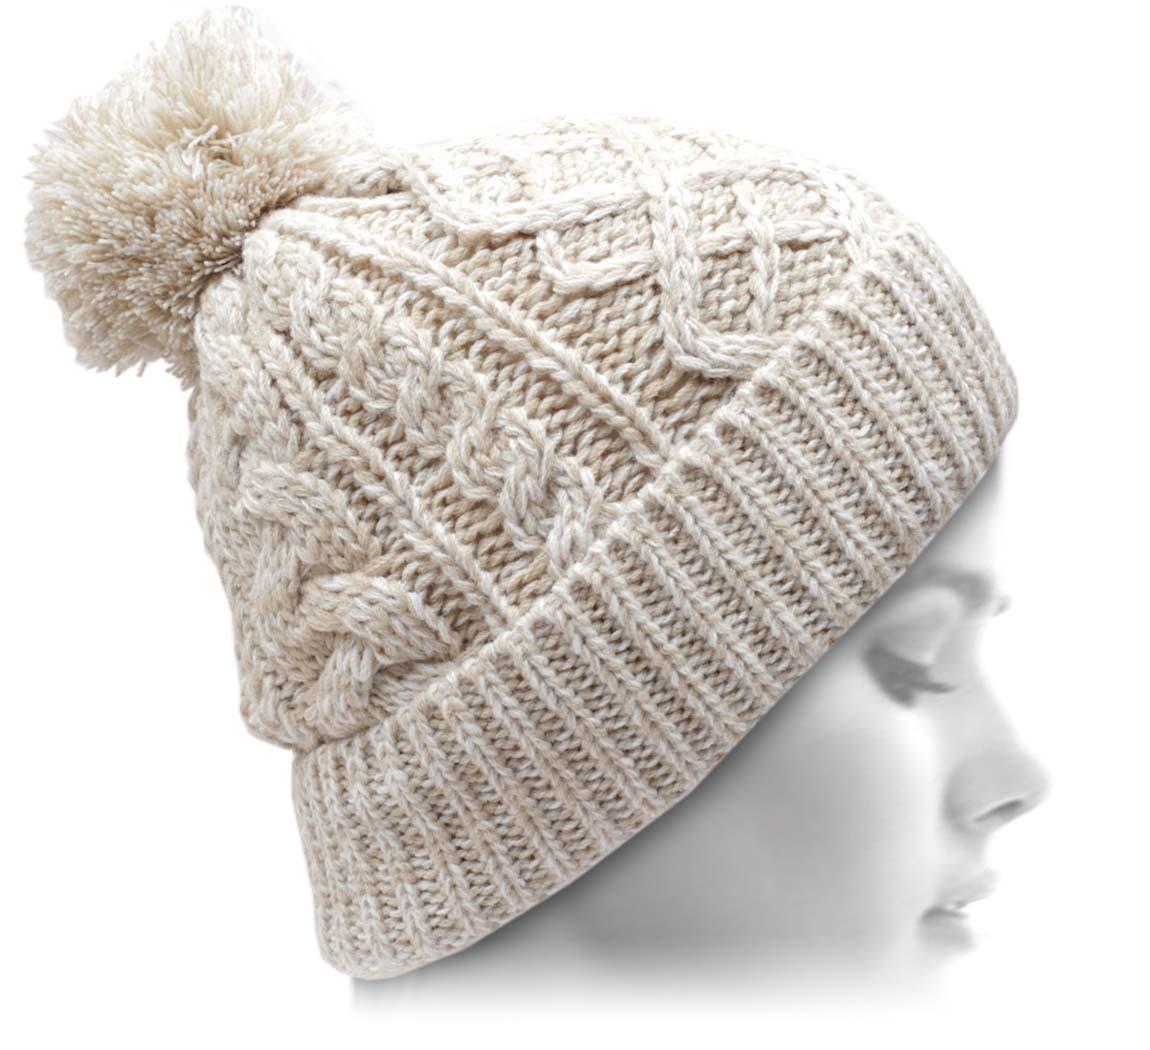 bonnet pompon creamy bonnet. Black Bedroom Furniture Sets. Home Design Ideas